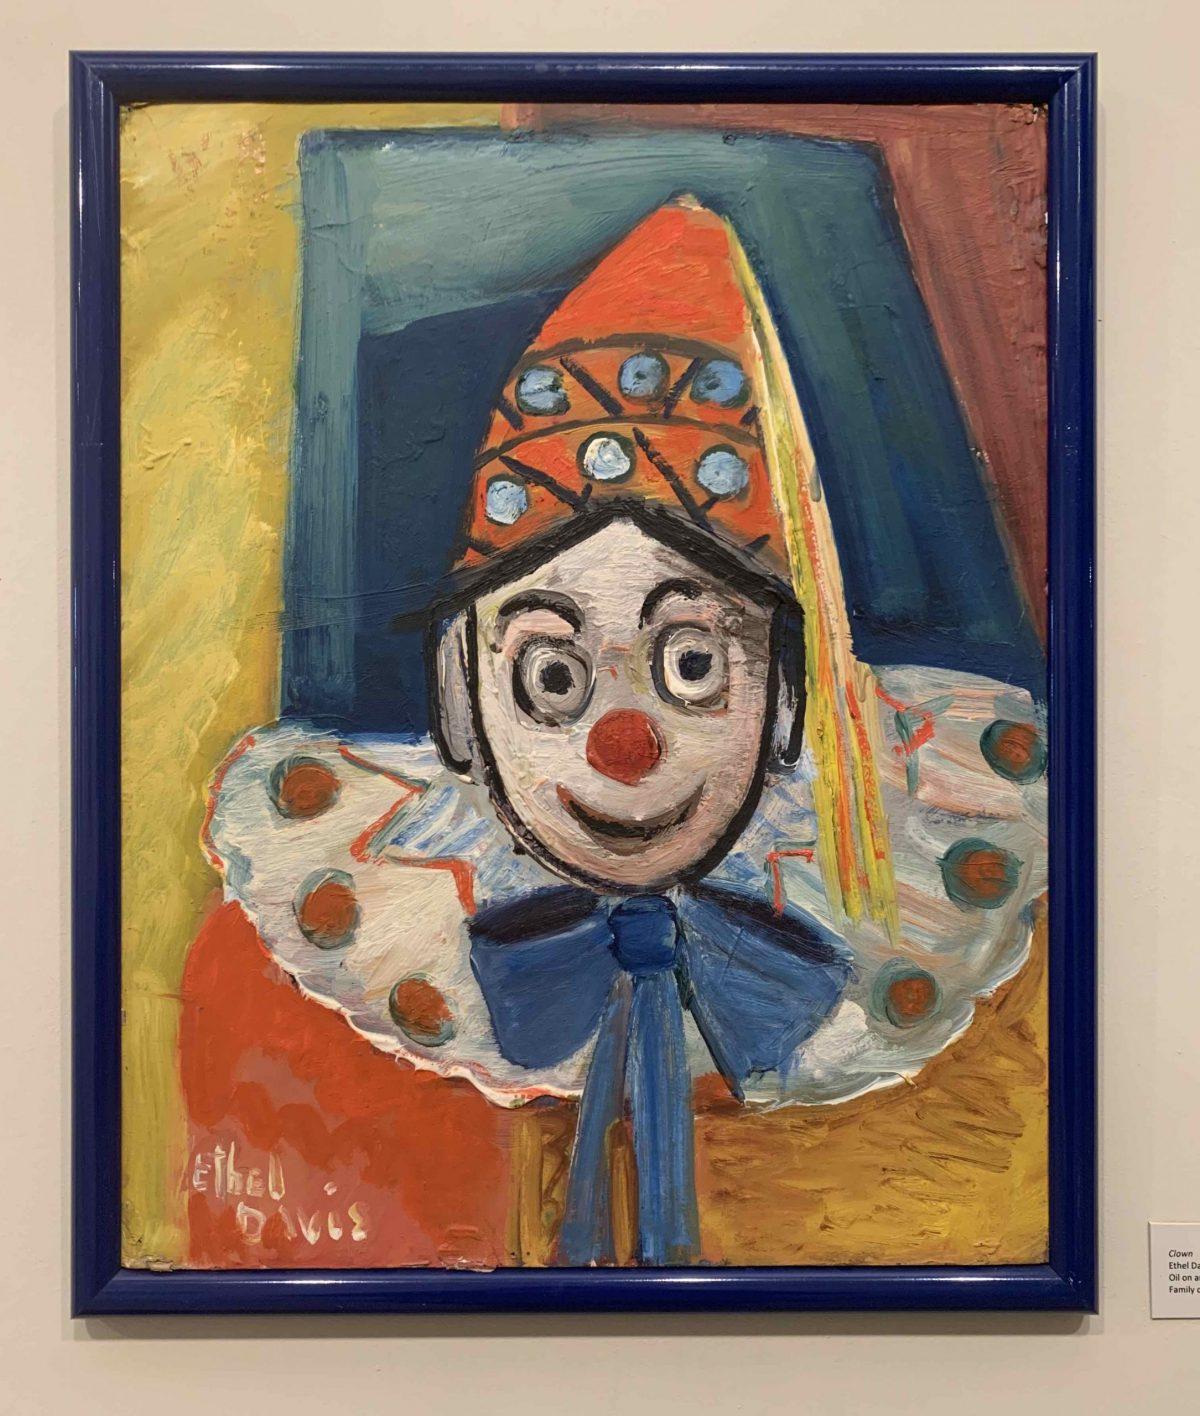 Clown by Ethel Davis